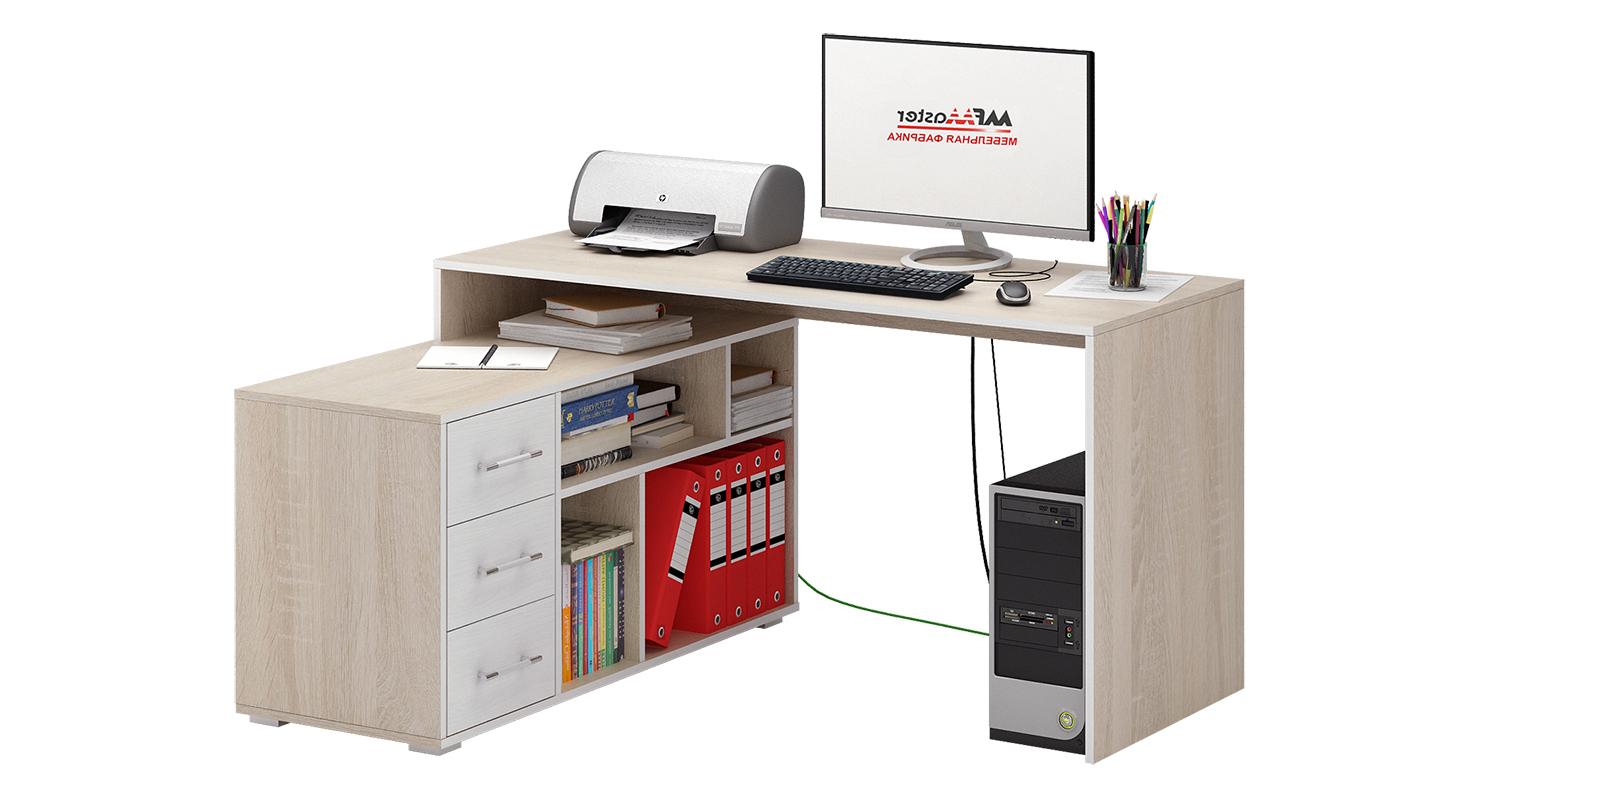 Стол компьютерный HomeMe Старк AFU0110000